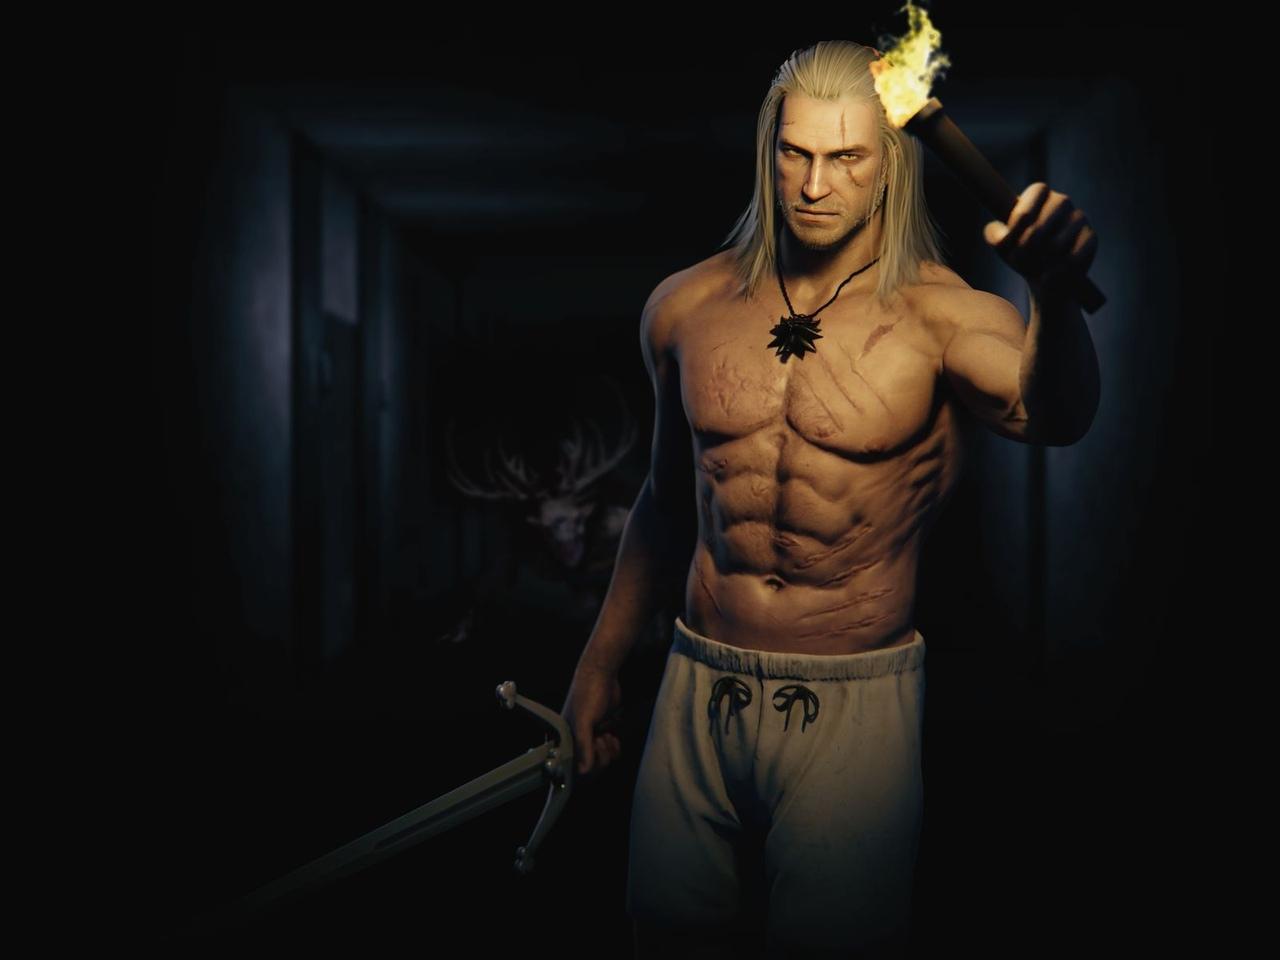 Геральт хардкорит против беса - The Witcher 3: Wild Hunt